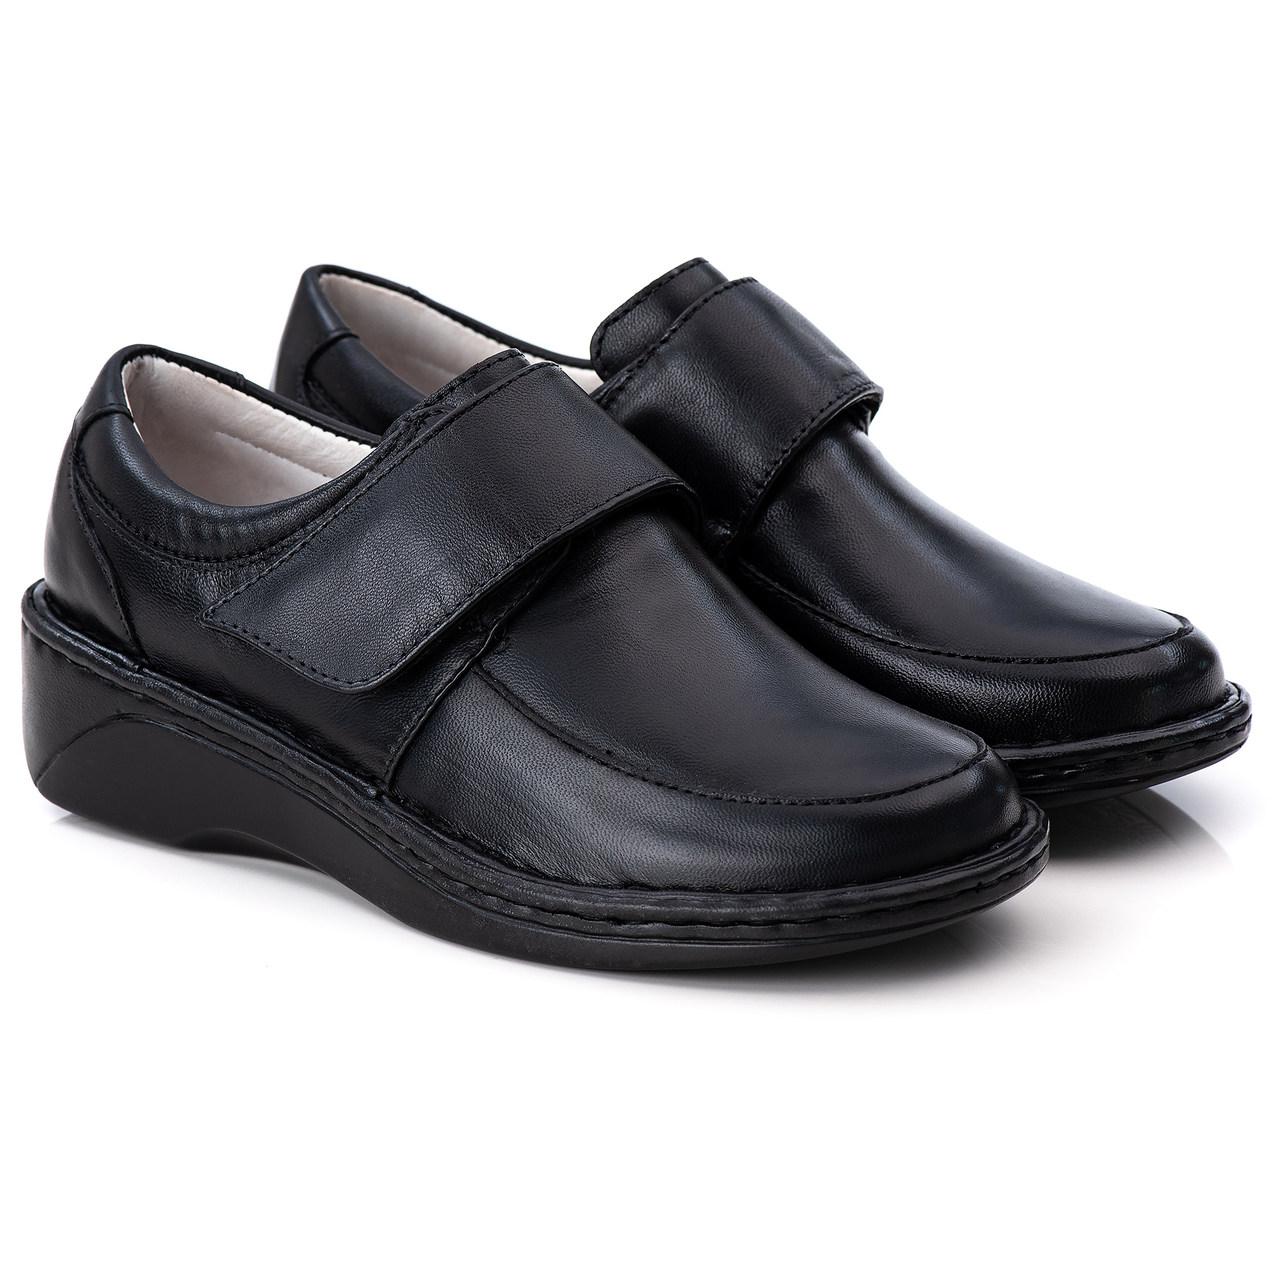 Sapato Antstress Feminino em Couro Legitimo F-220